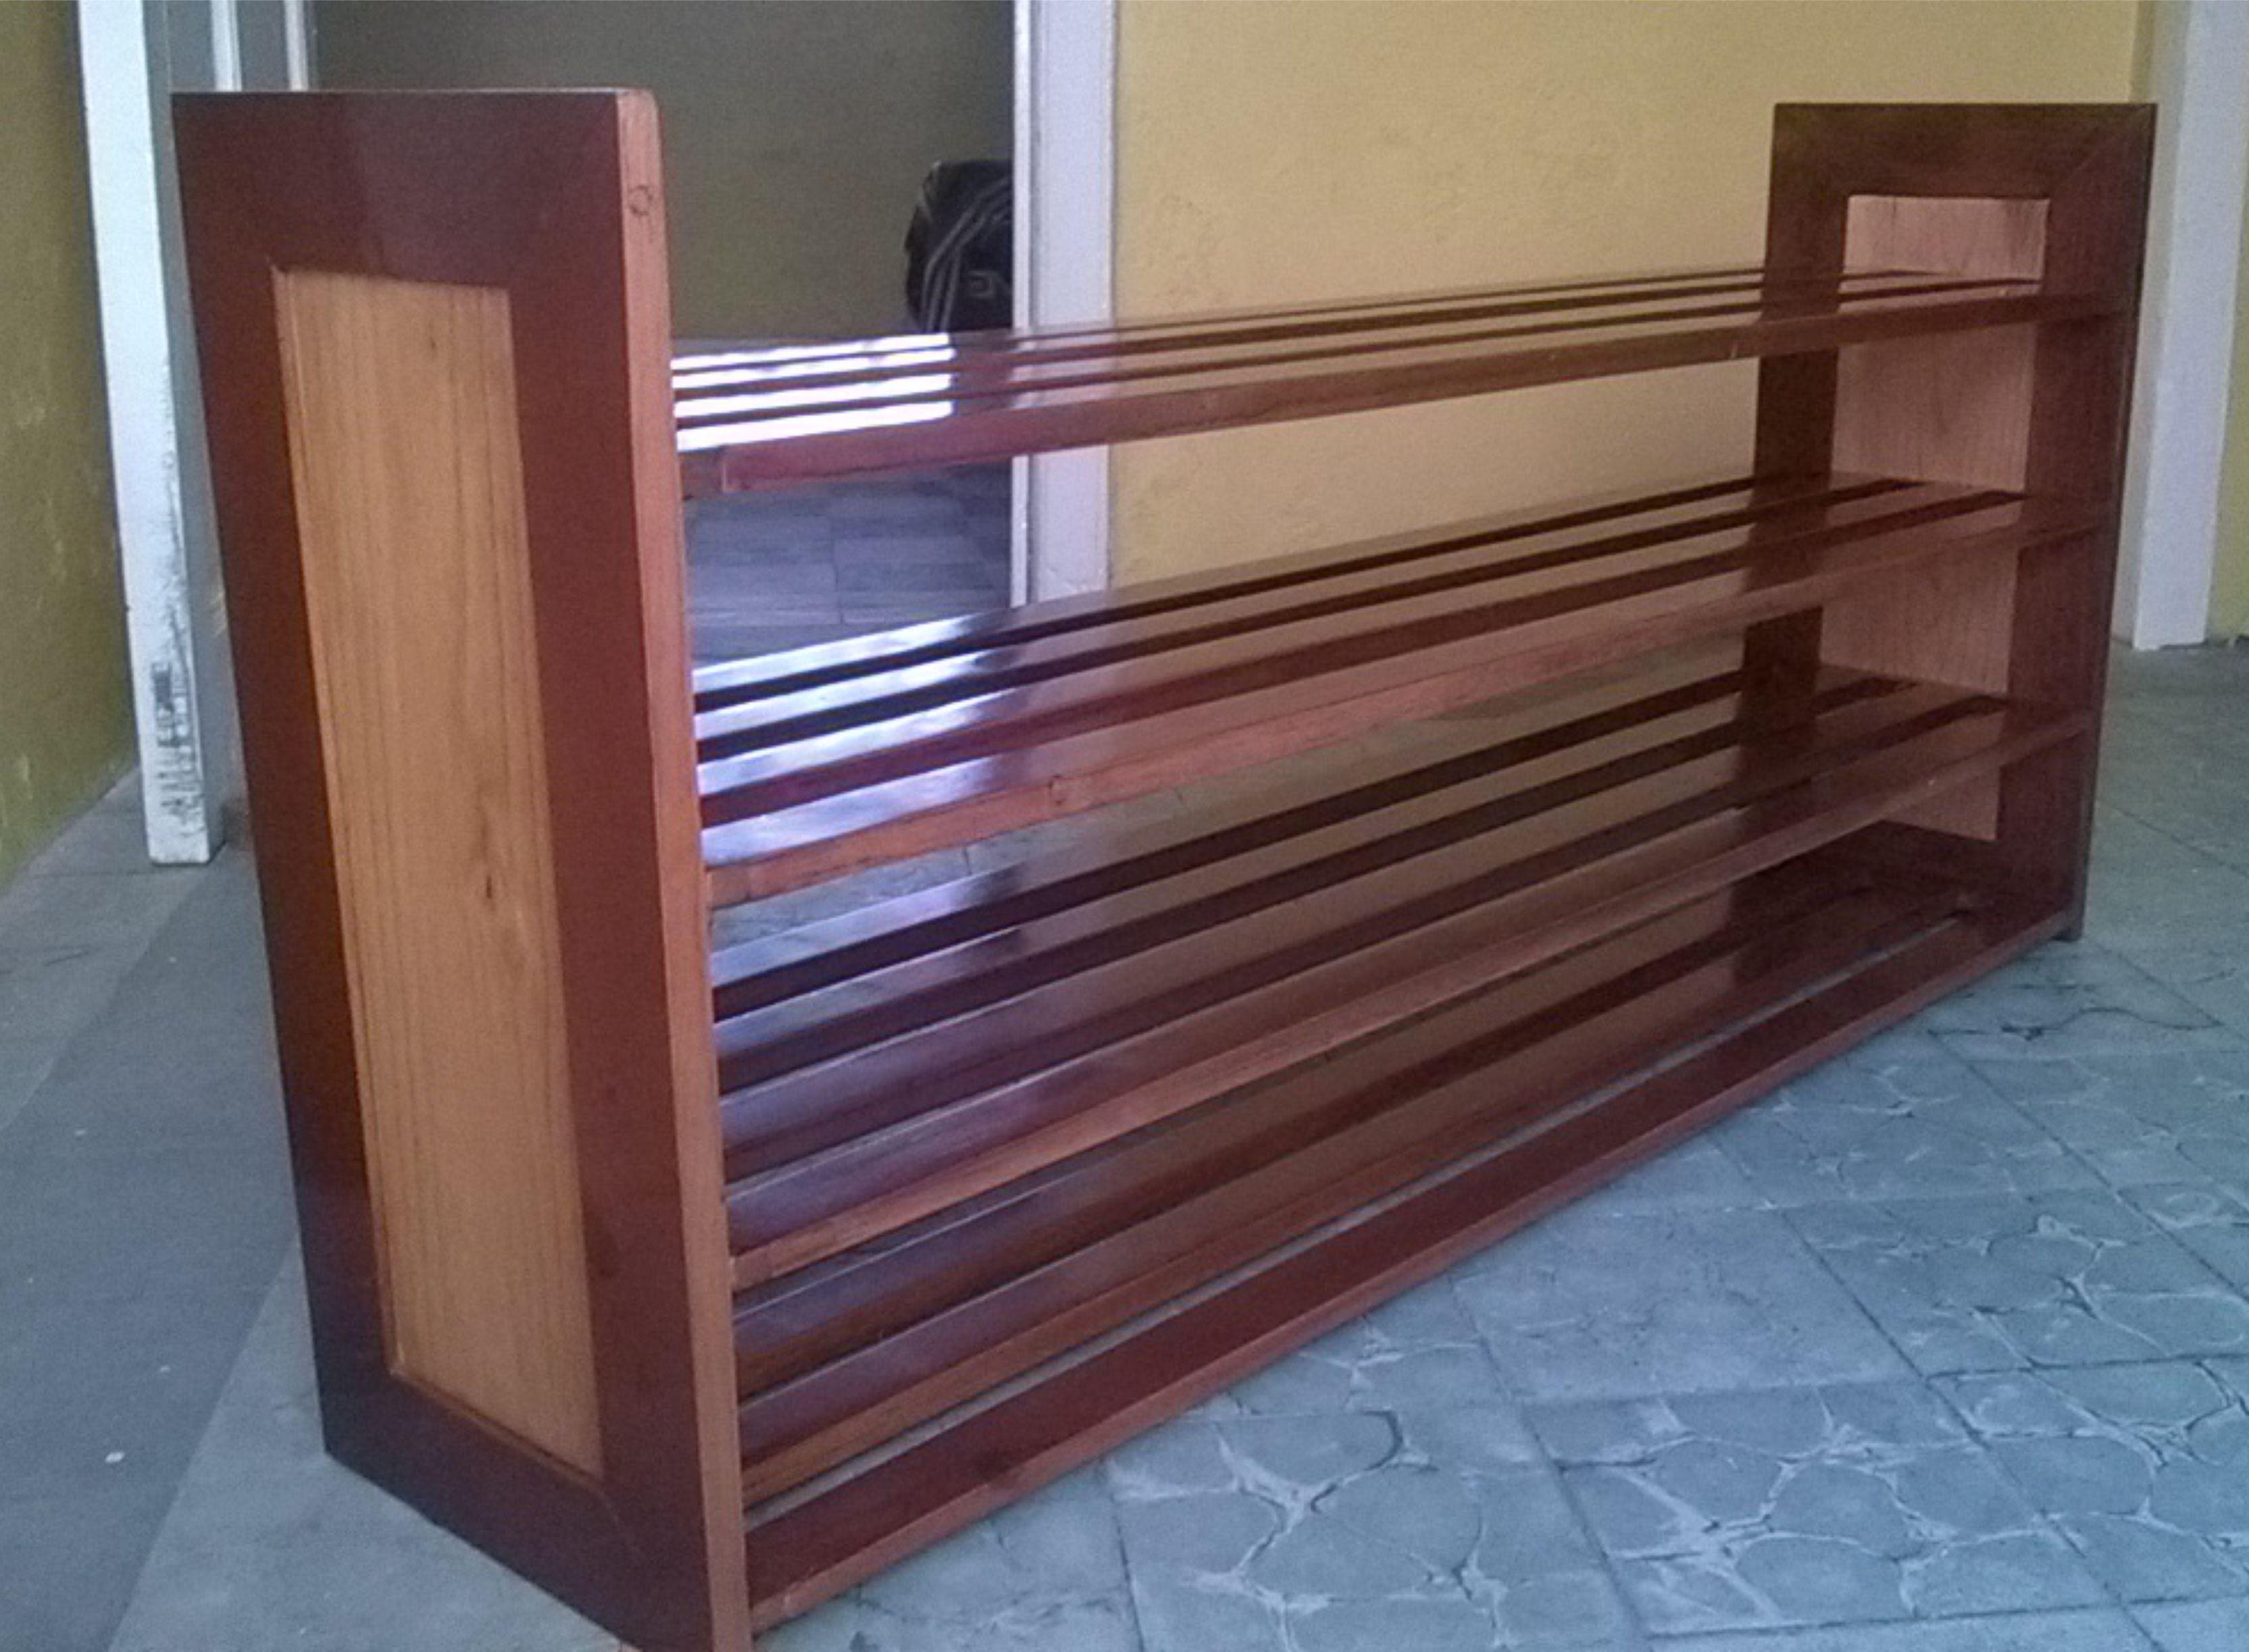 zapatera de madera de pino con barniz de polyuretano